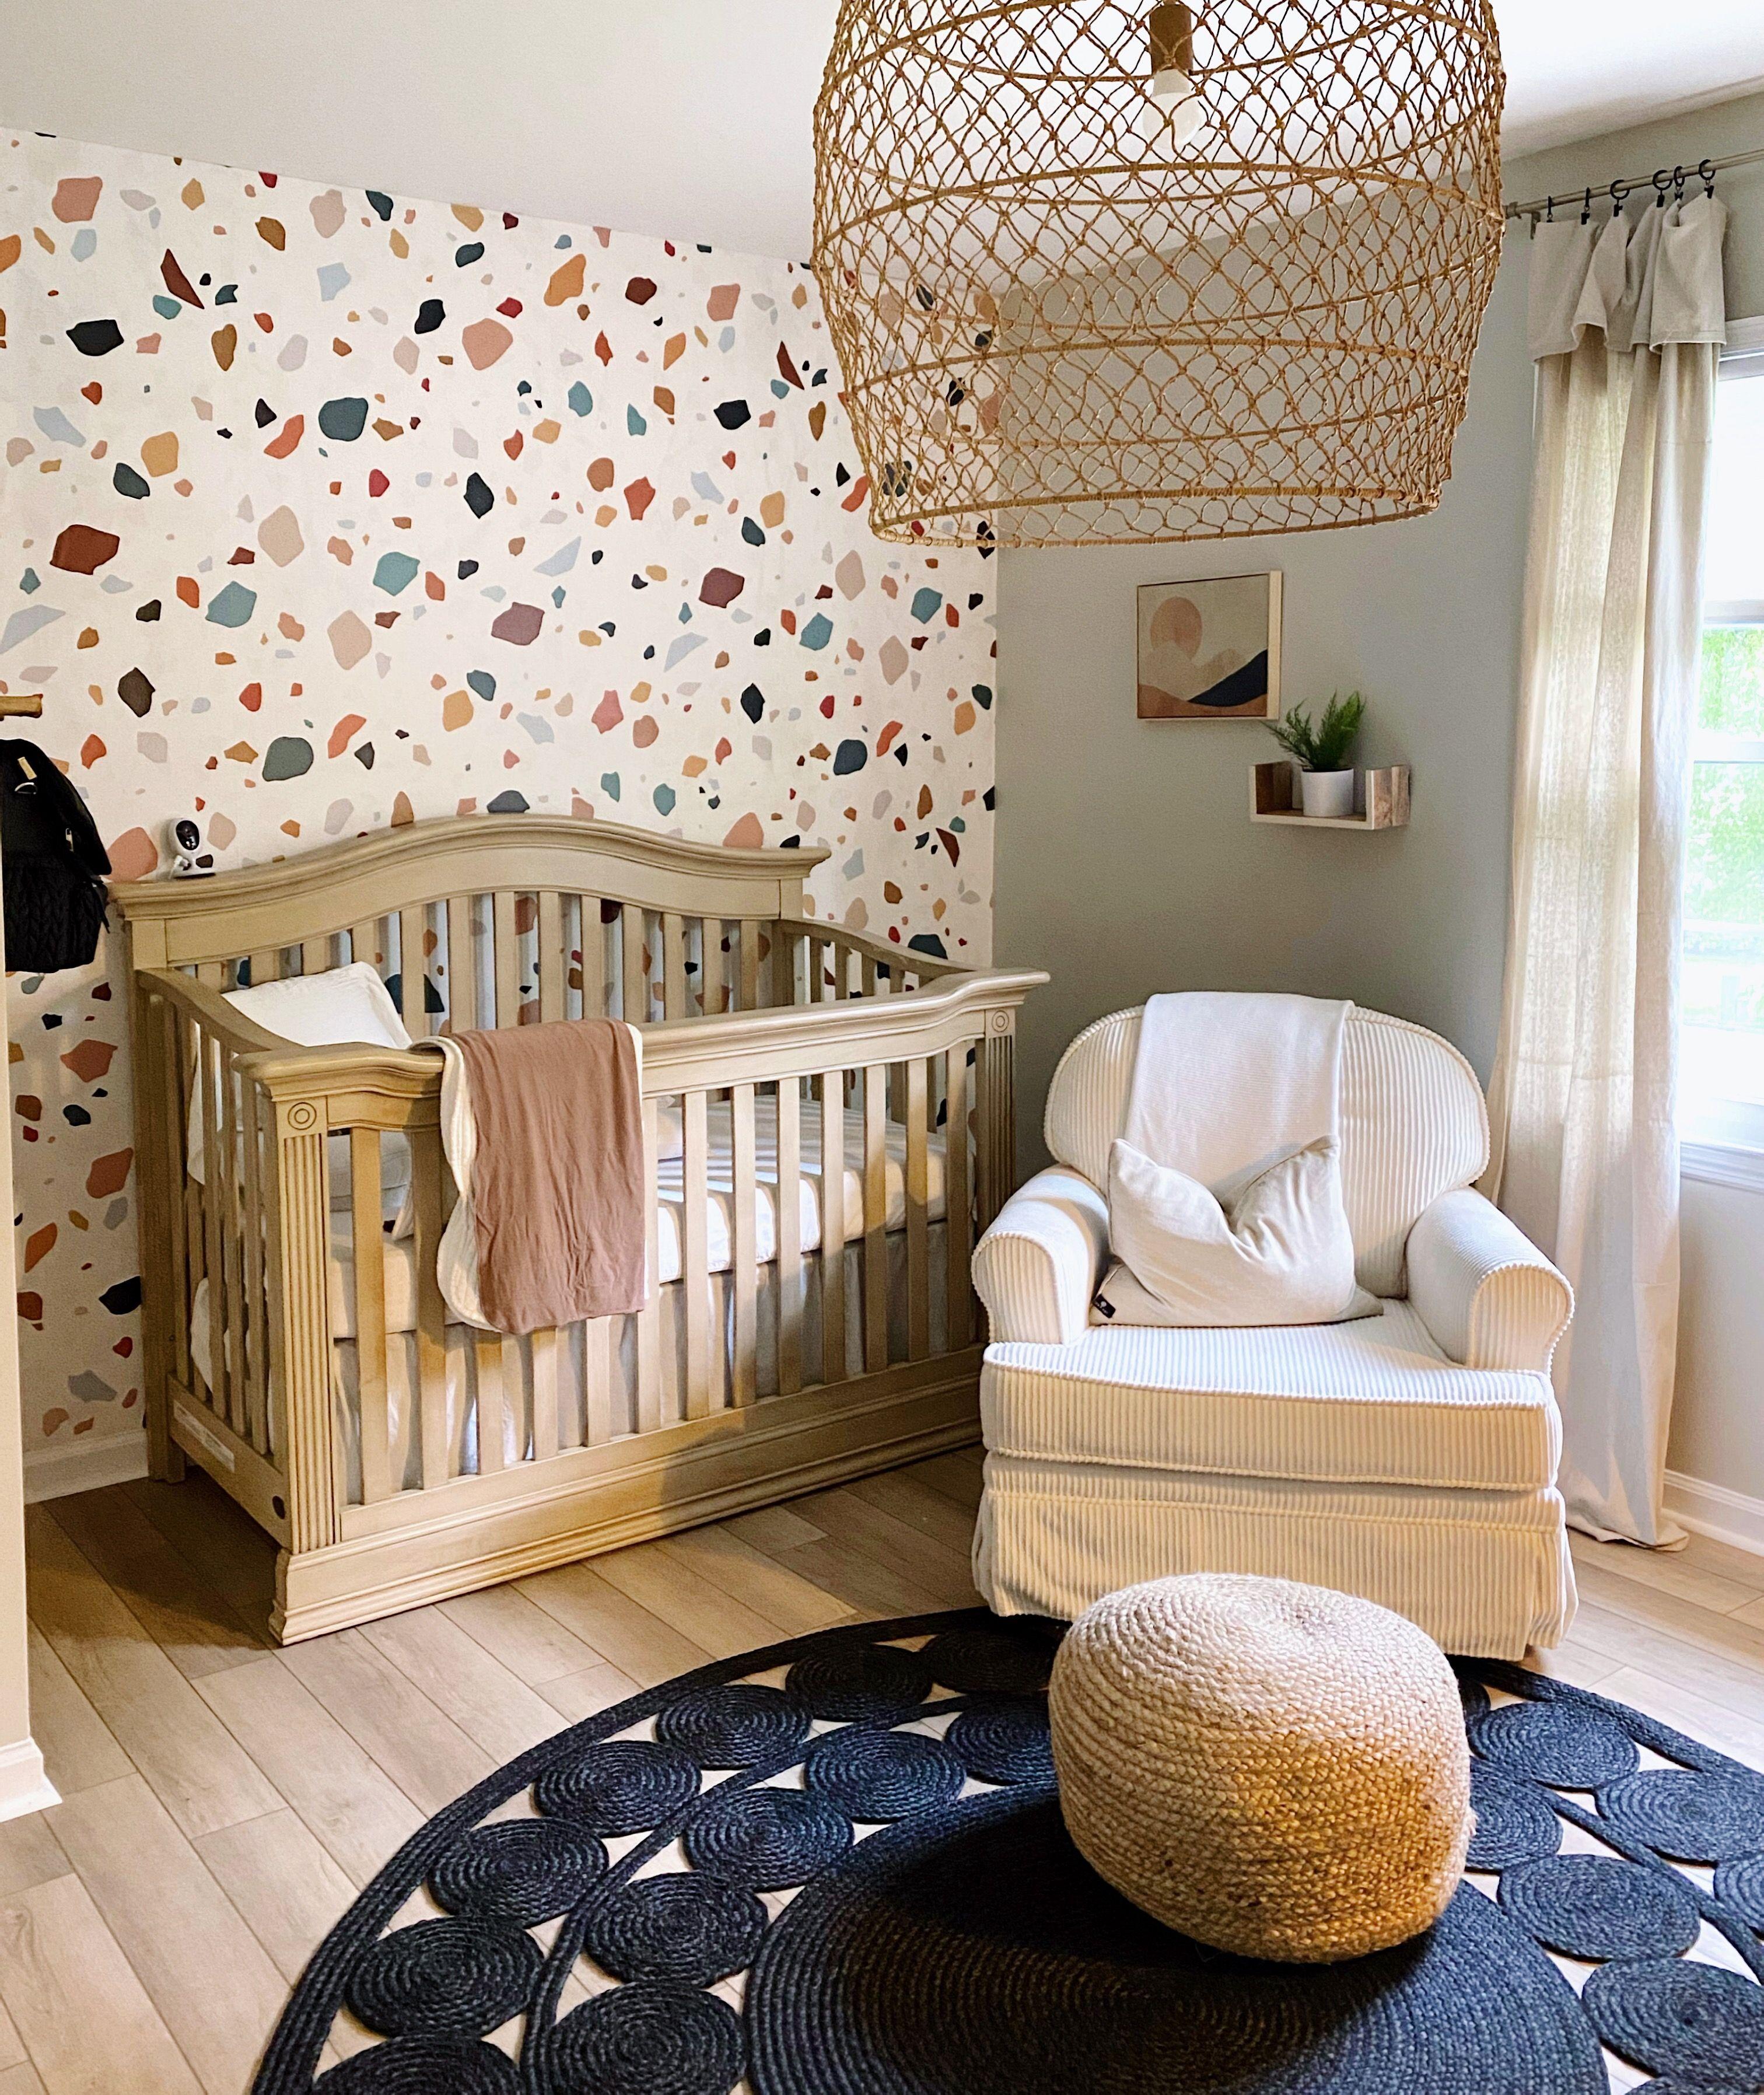 The Terrazzo Wallpaper In 2021 Girls Room Wallpaper Nursery Wallpaper Accent Wall Modern Kids Room